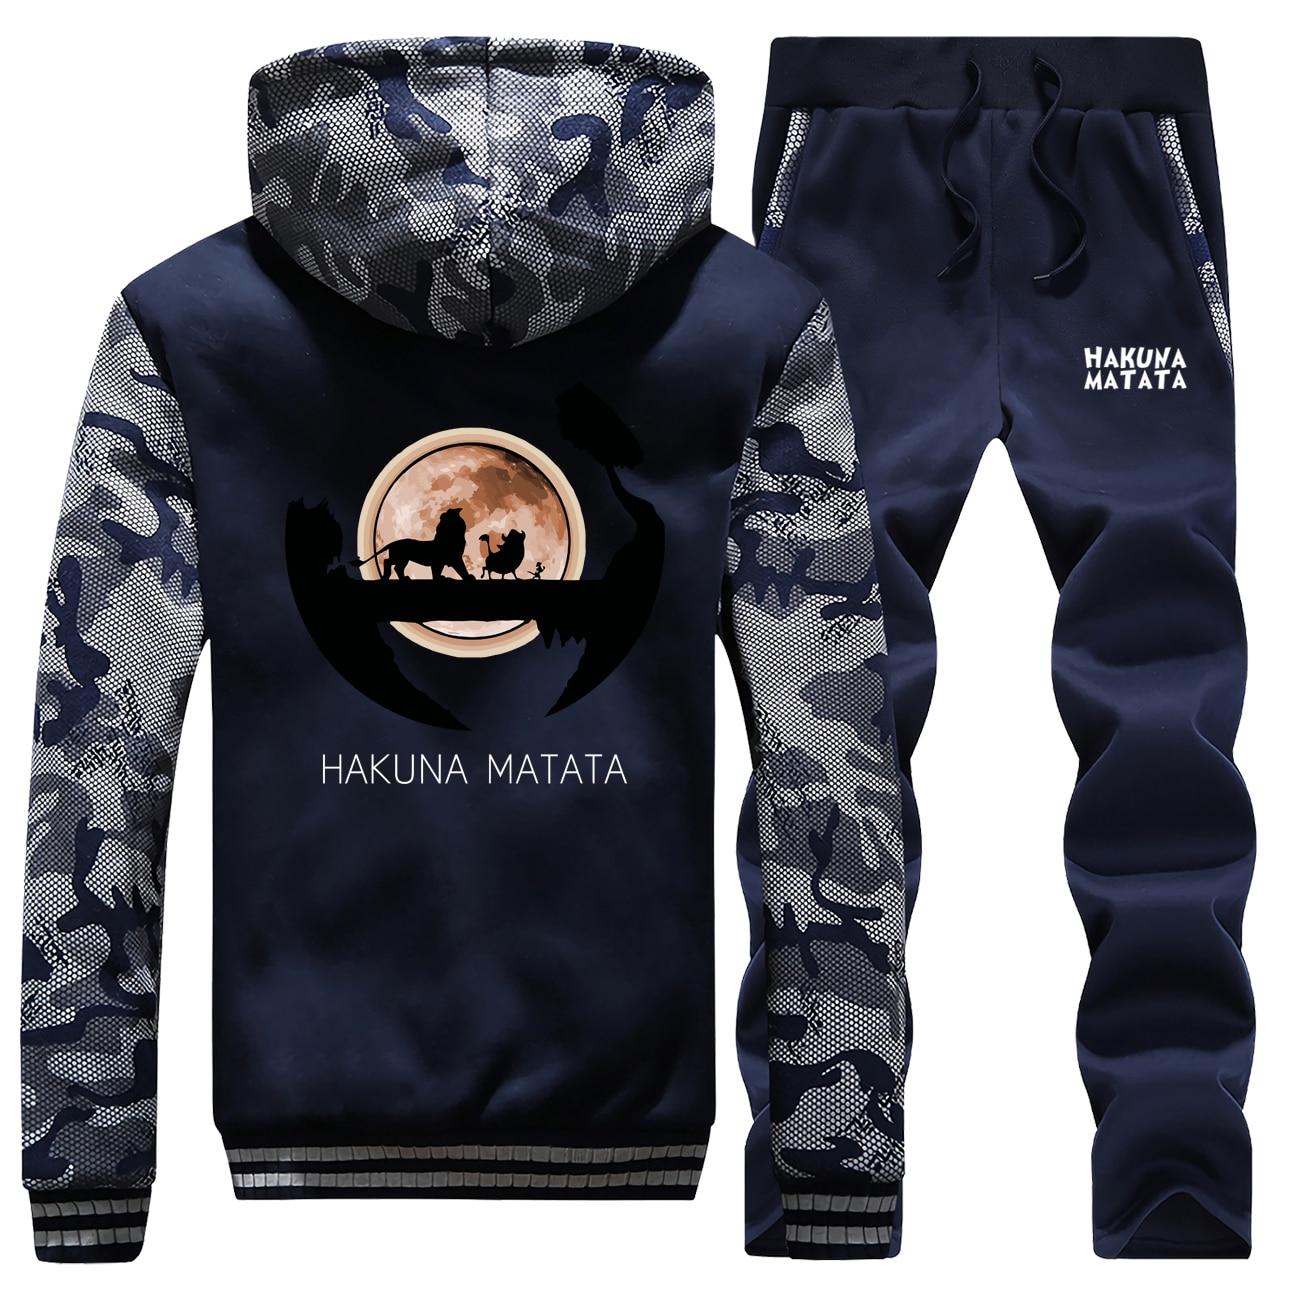 The Lion King Cartoon Jacket+Pants 2 Piece Sets Camo Men Thick Hoodie Sweatshirt Suit HAKUNA MATATA Print Coat Casual Tracksuit